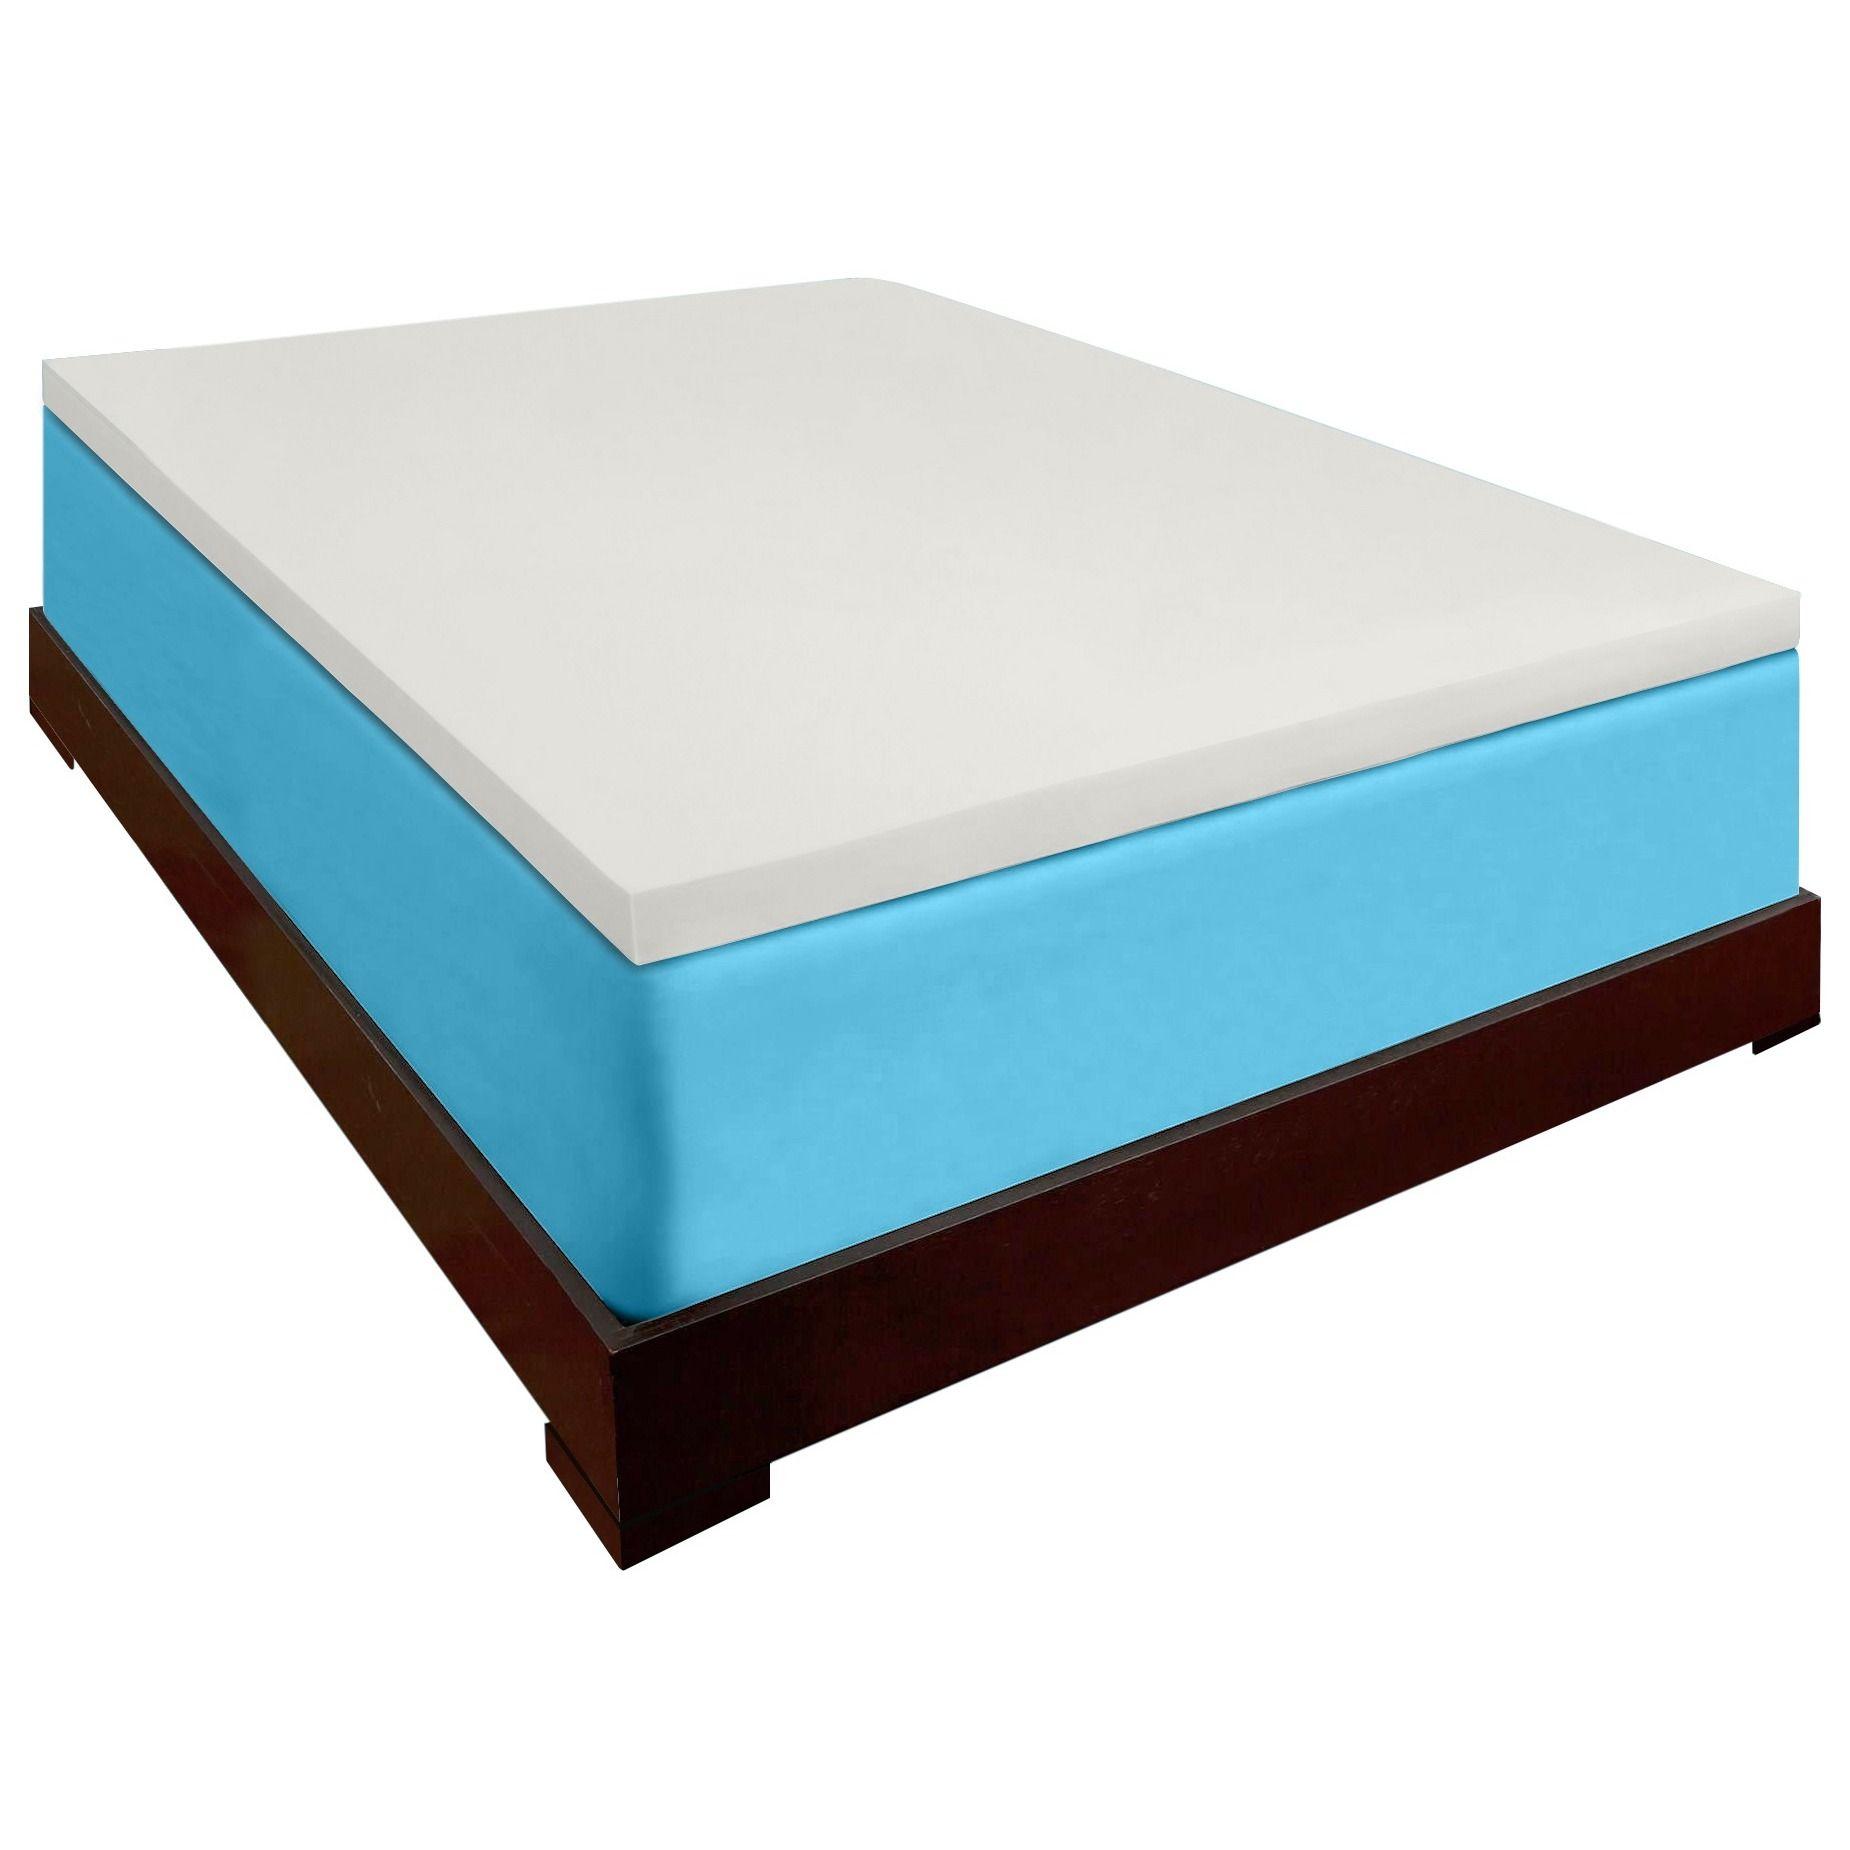 Dreamdna 3 Inch 4 Pound Density Memory Foam Mattress